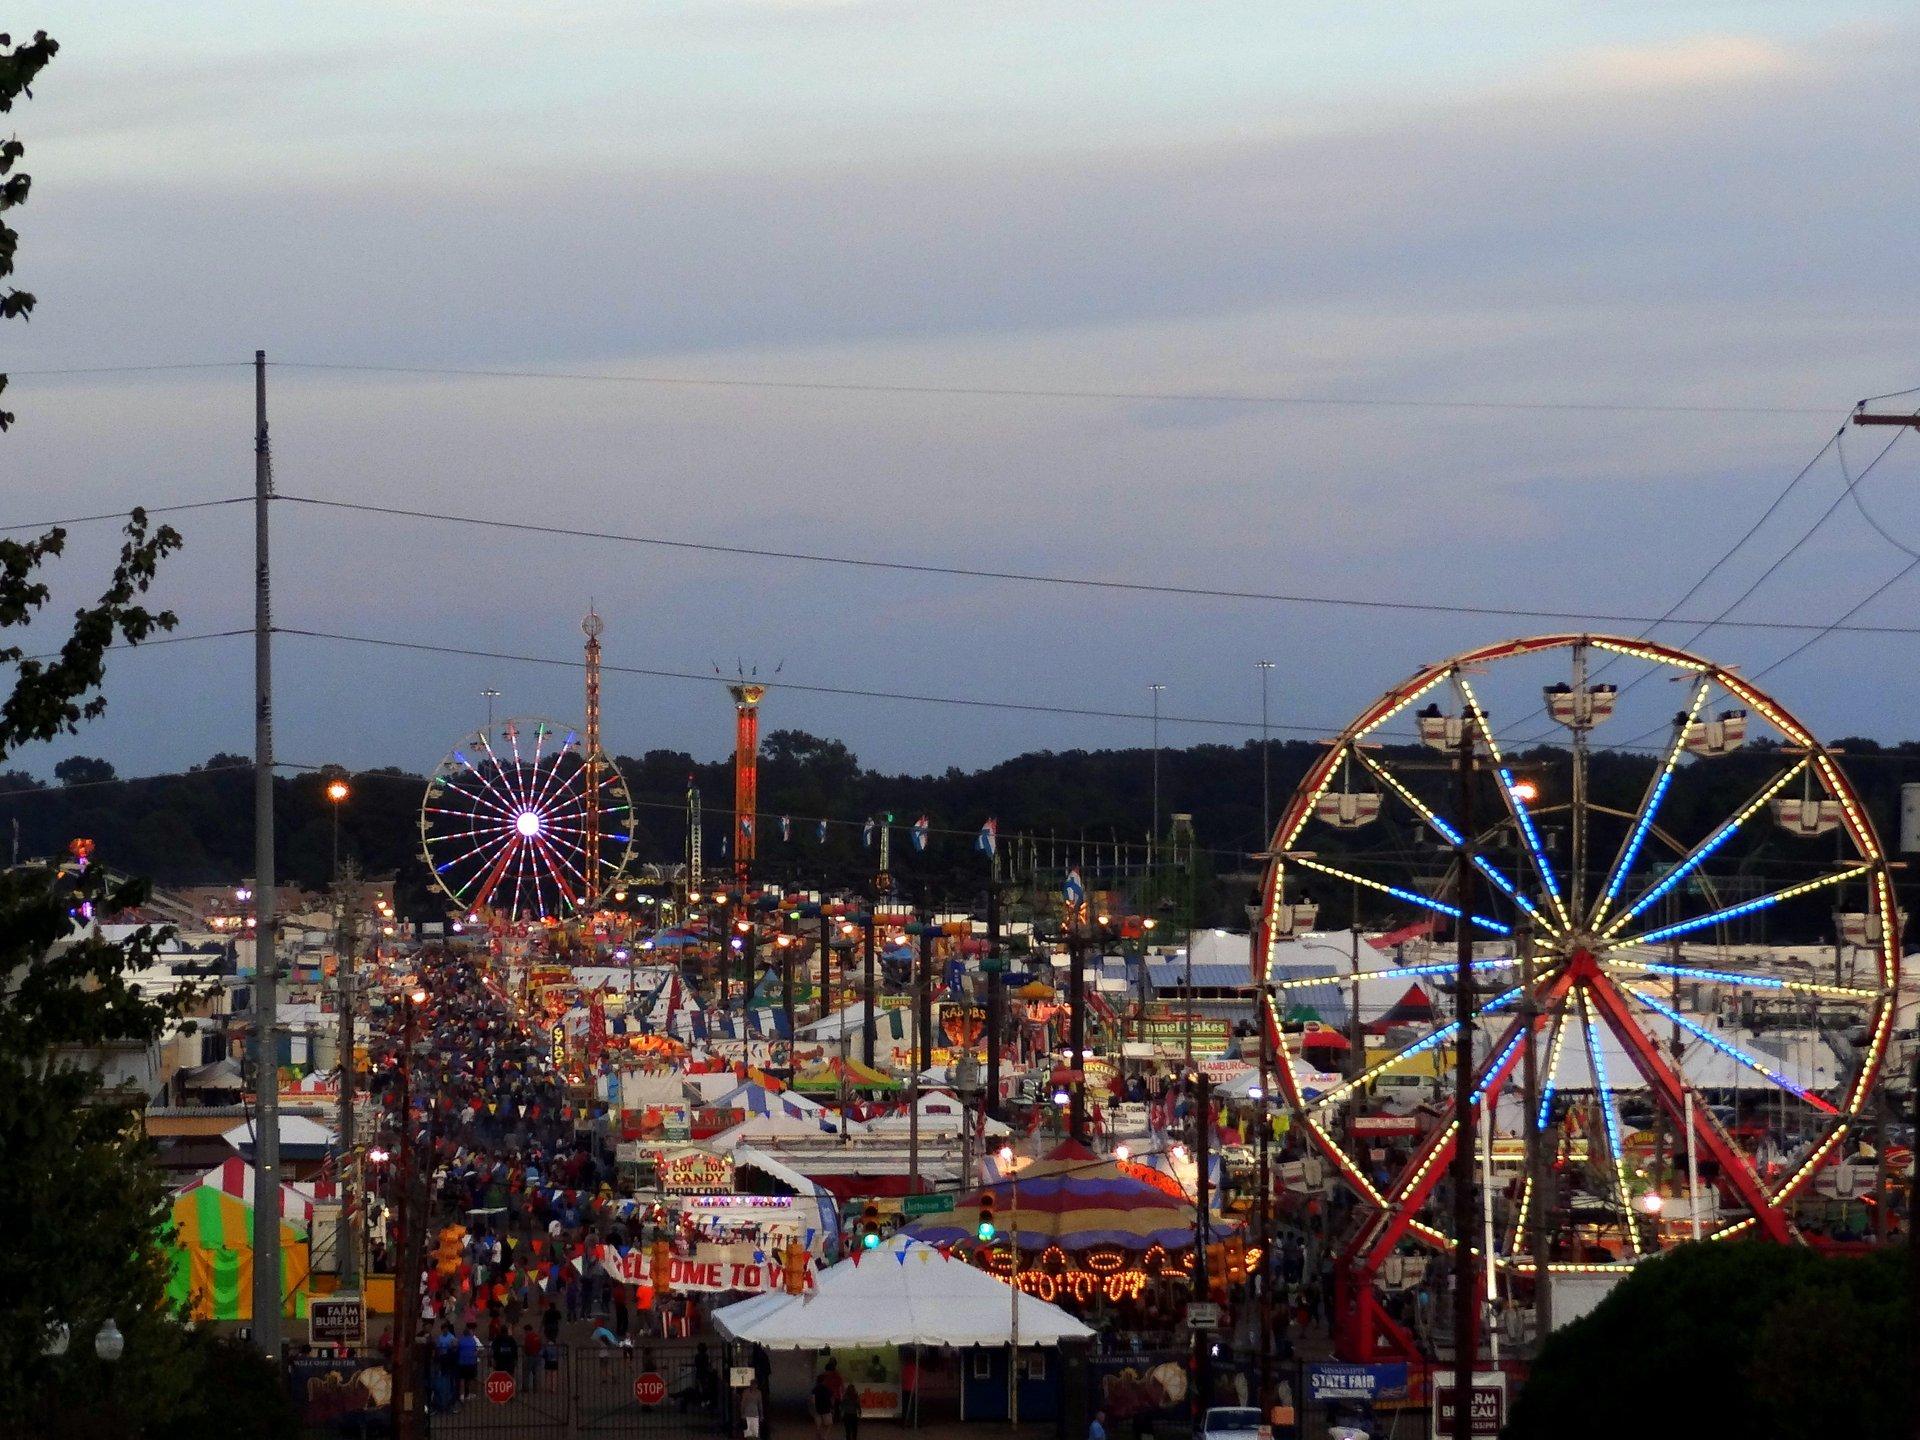 Mississippi State Fair  in Mississippi - Best Season 2020